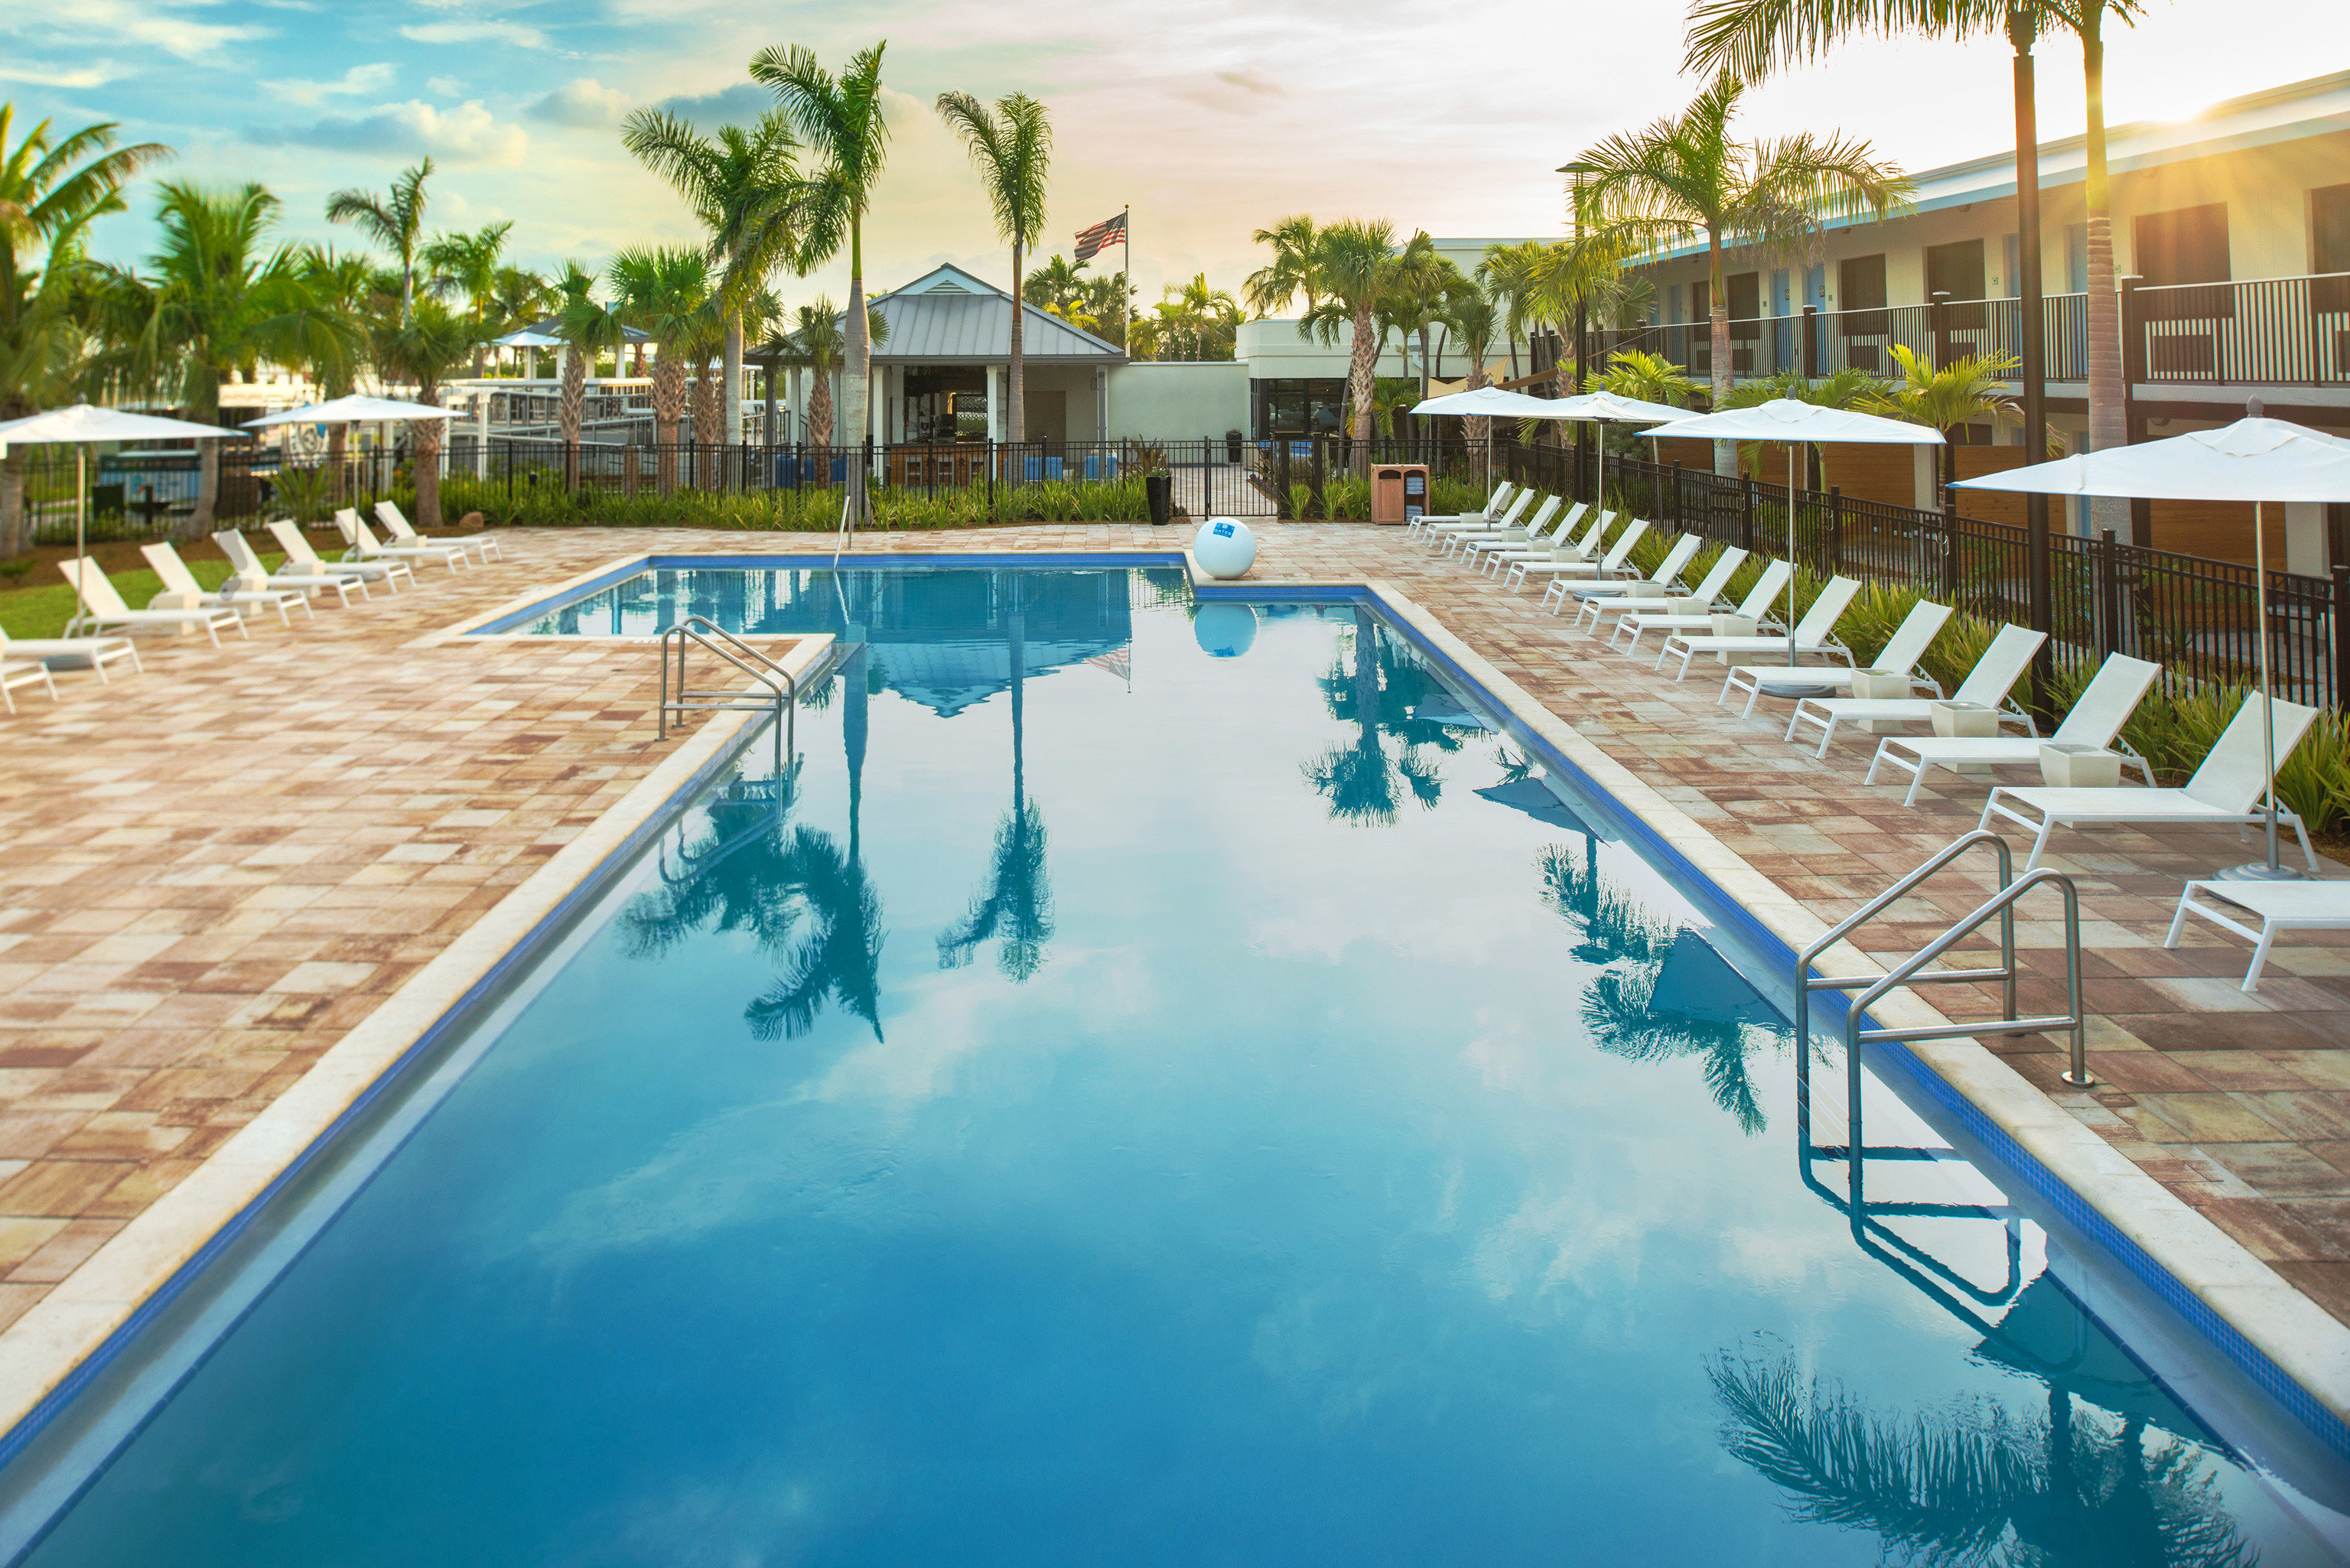 tree sky Resort swimming pool leisure property building Pool reflecting pool backyard condominium Villa Deck lined Garden